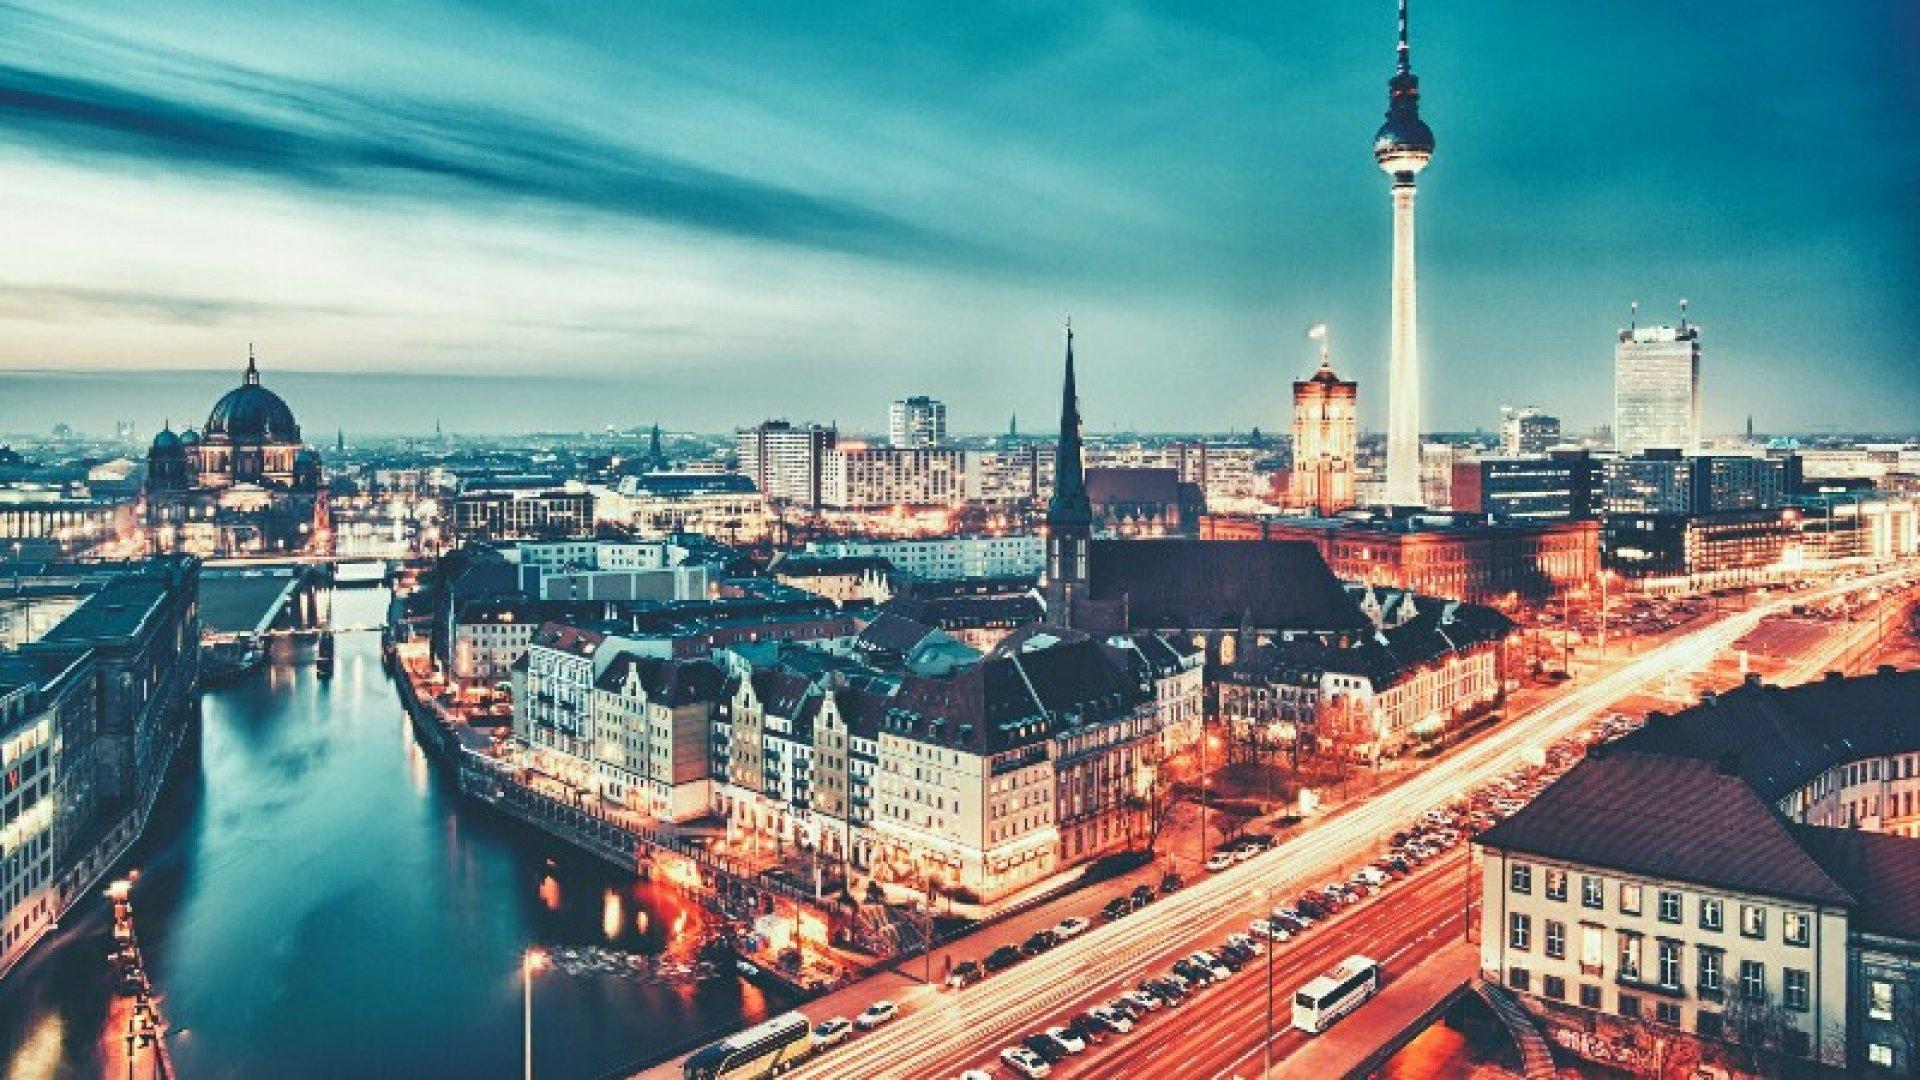 Berlin hd wallpaper 1080p for pc